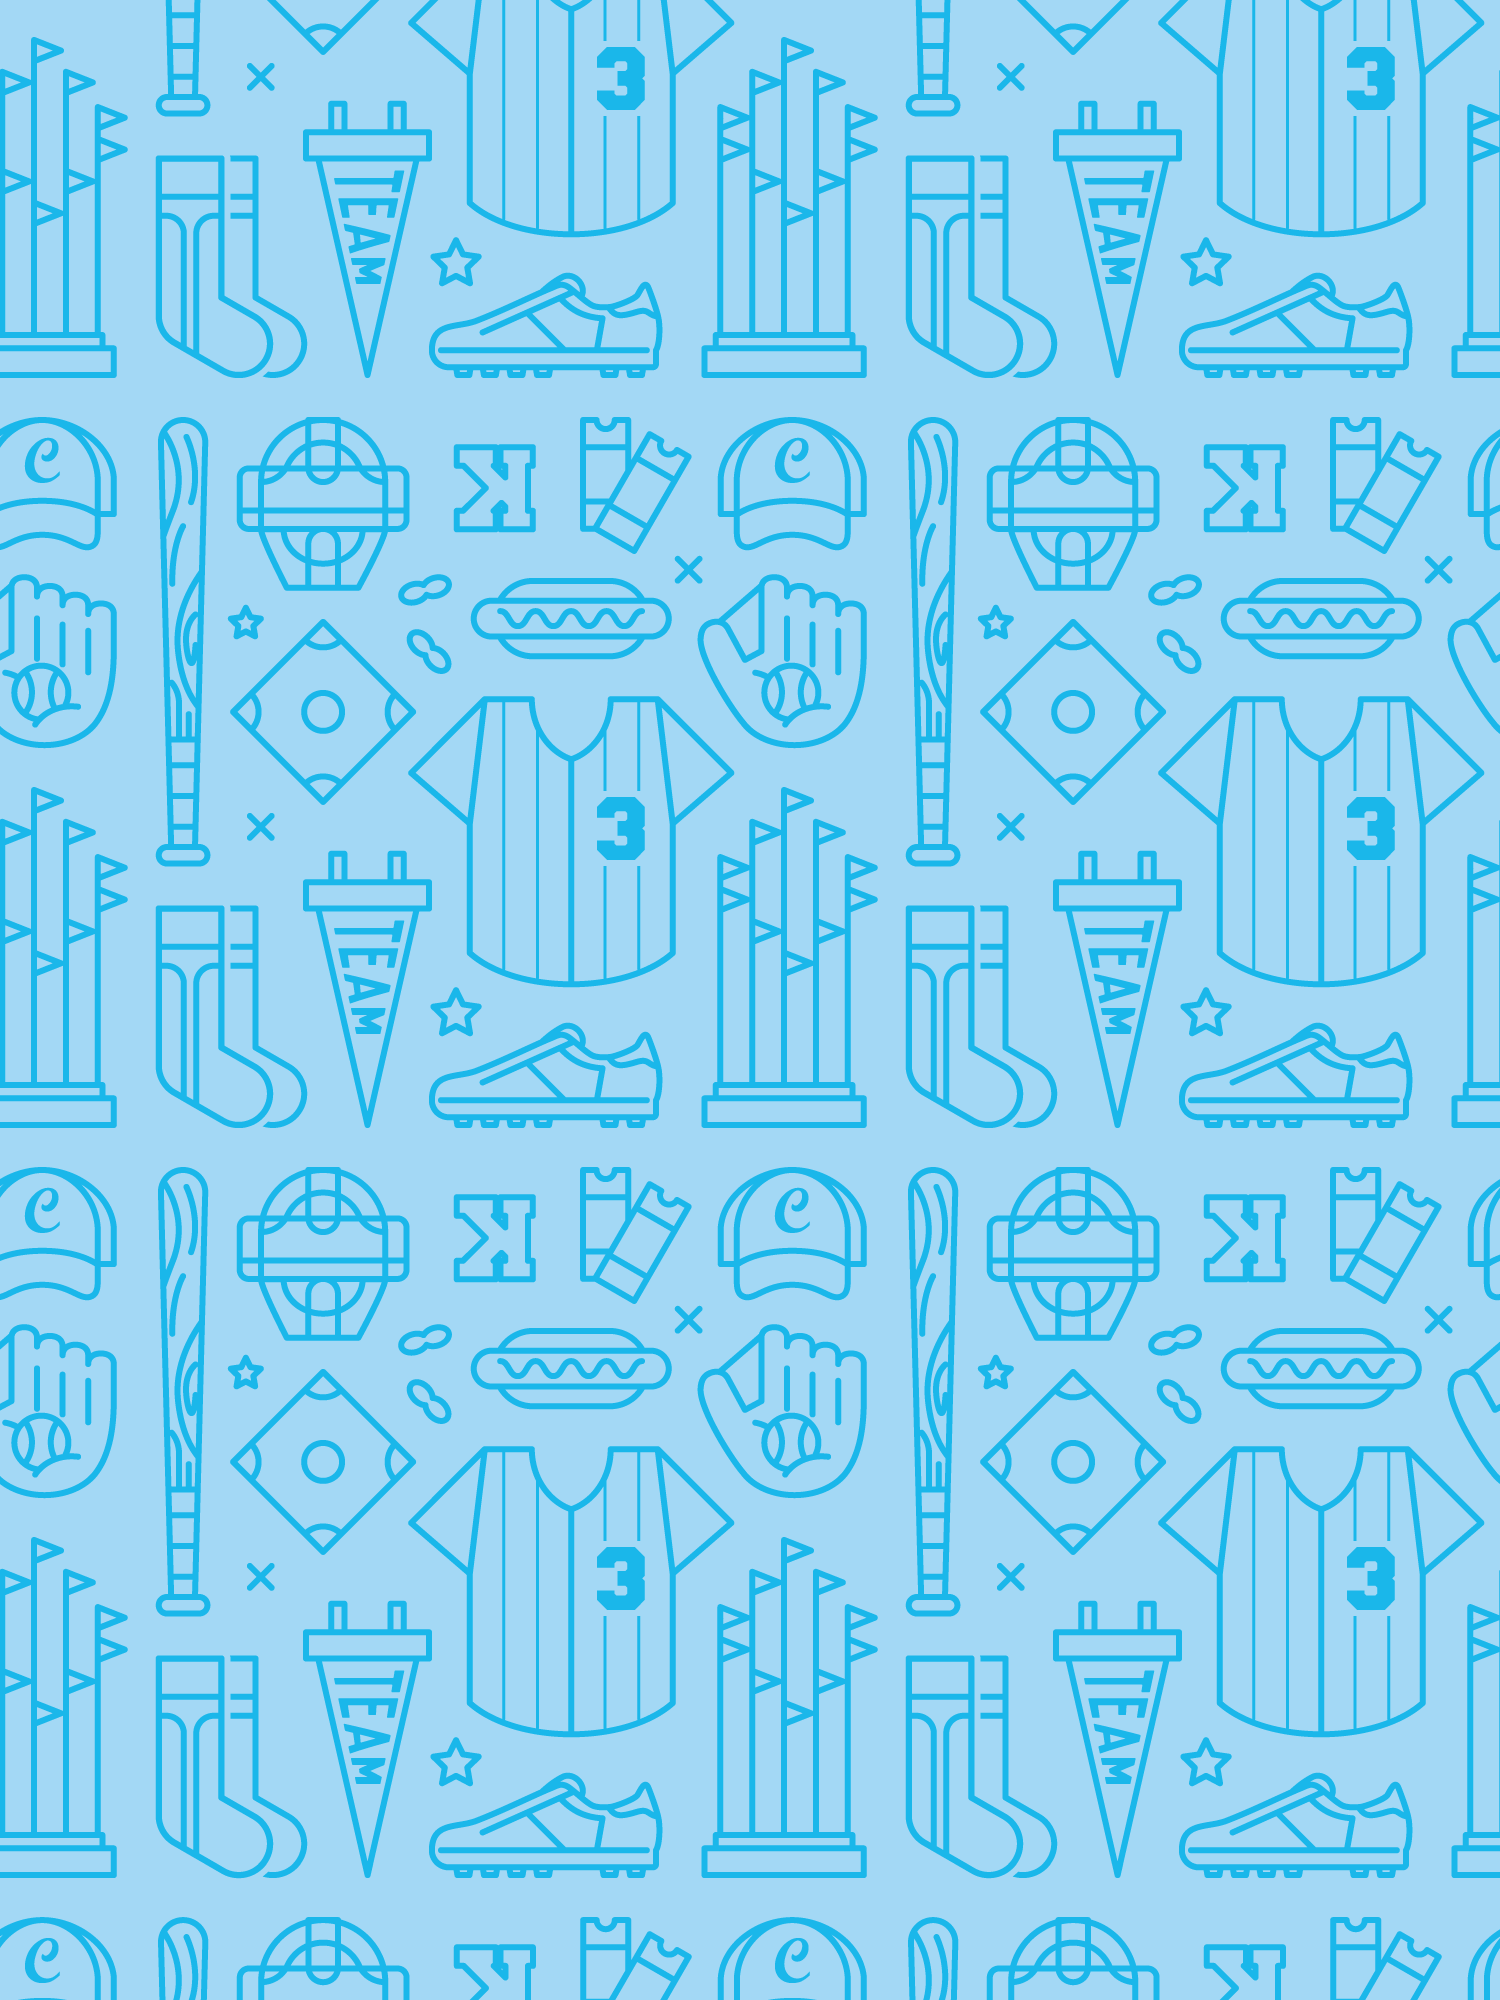 stein-baseball-pattern.png